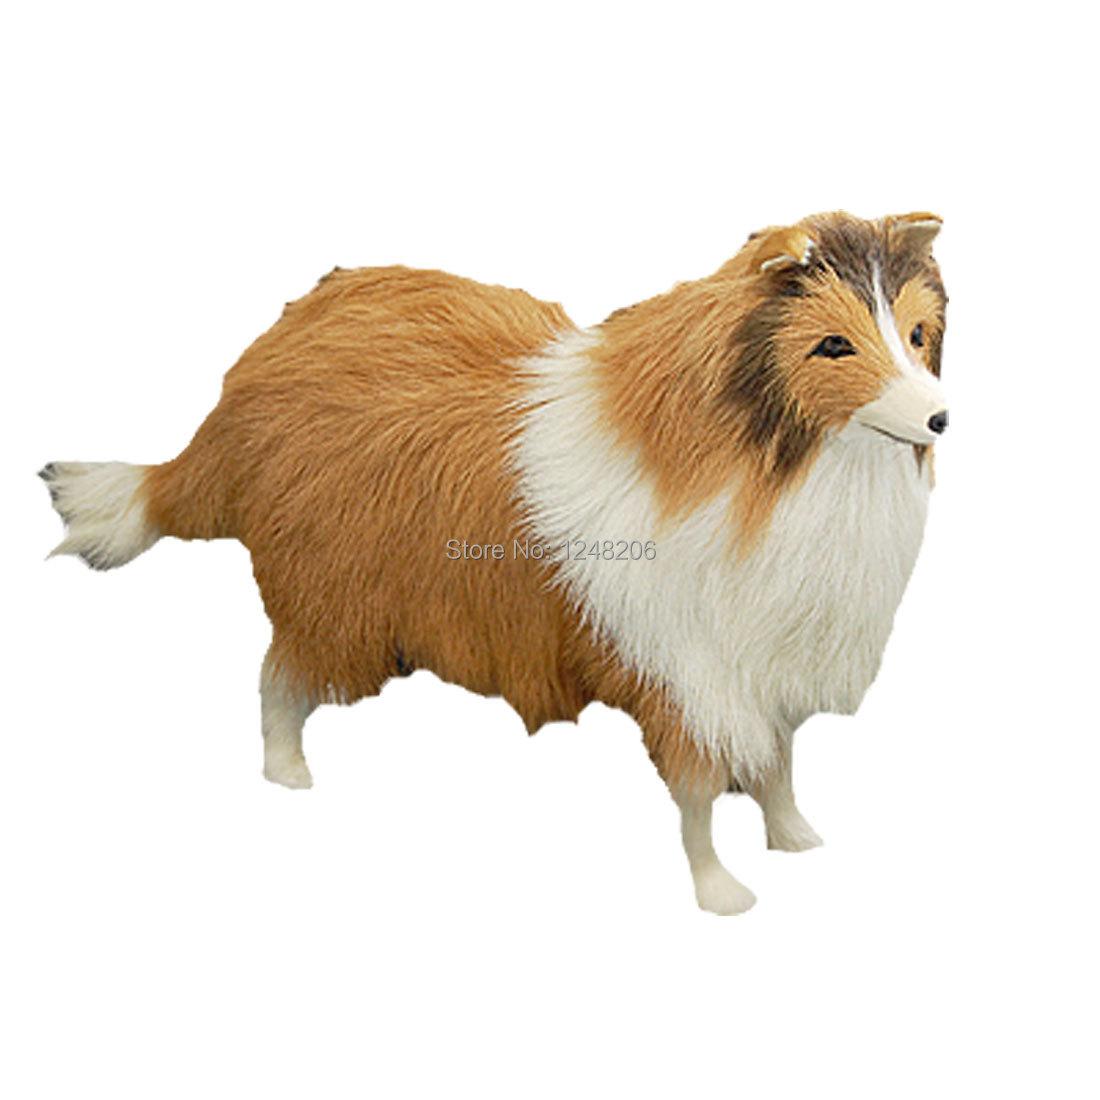 Scotland Sheepdog Animal Desk Decoration Craft Gift Discount 50(China (Mainland))